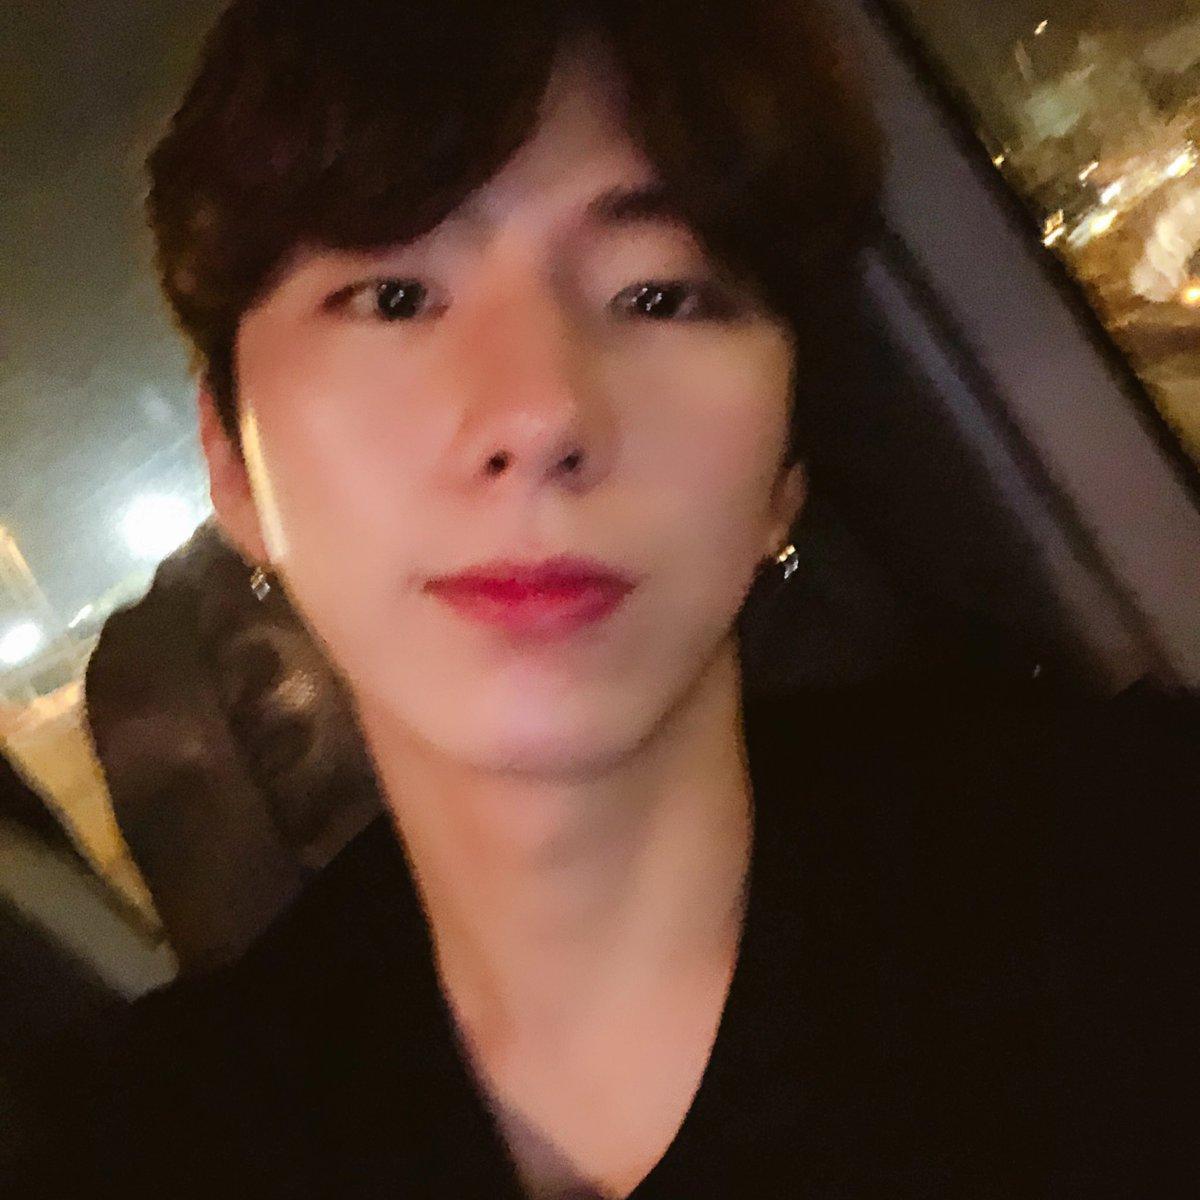 RT @OfficialMonstaX: [#기현] 끝났다!!!!!!!!!!! 한국갑니다앙😍 홍콩몬베베 다시 만날때까지 잘있어요!!!!!! https://t.co/oOg5GfK8H1